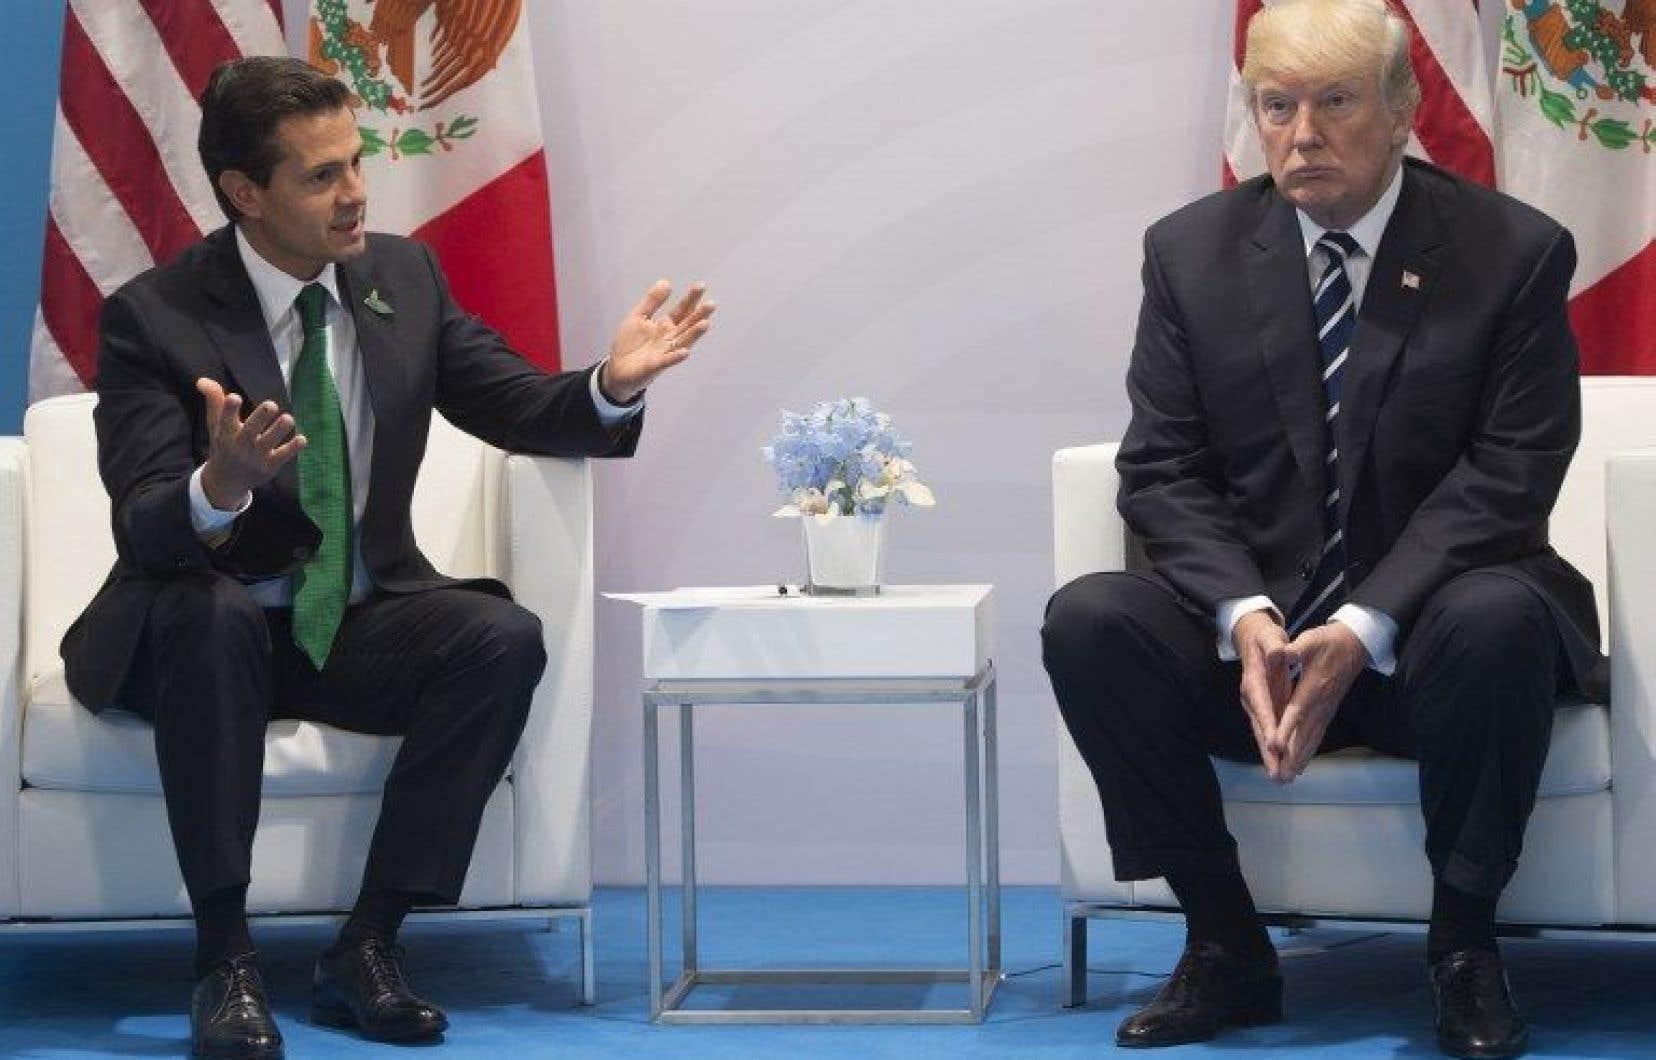 Enrique Peña Nieto a rencontré Donald Trump pendant le G20.